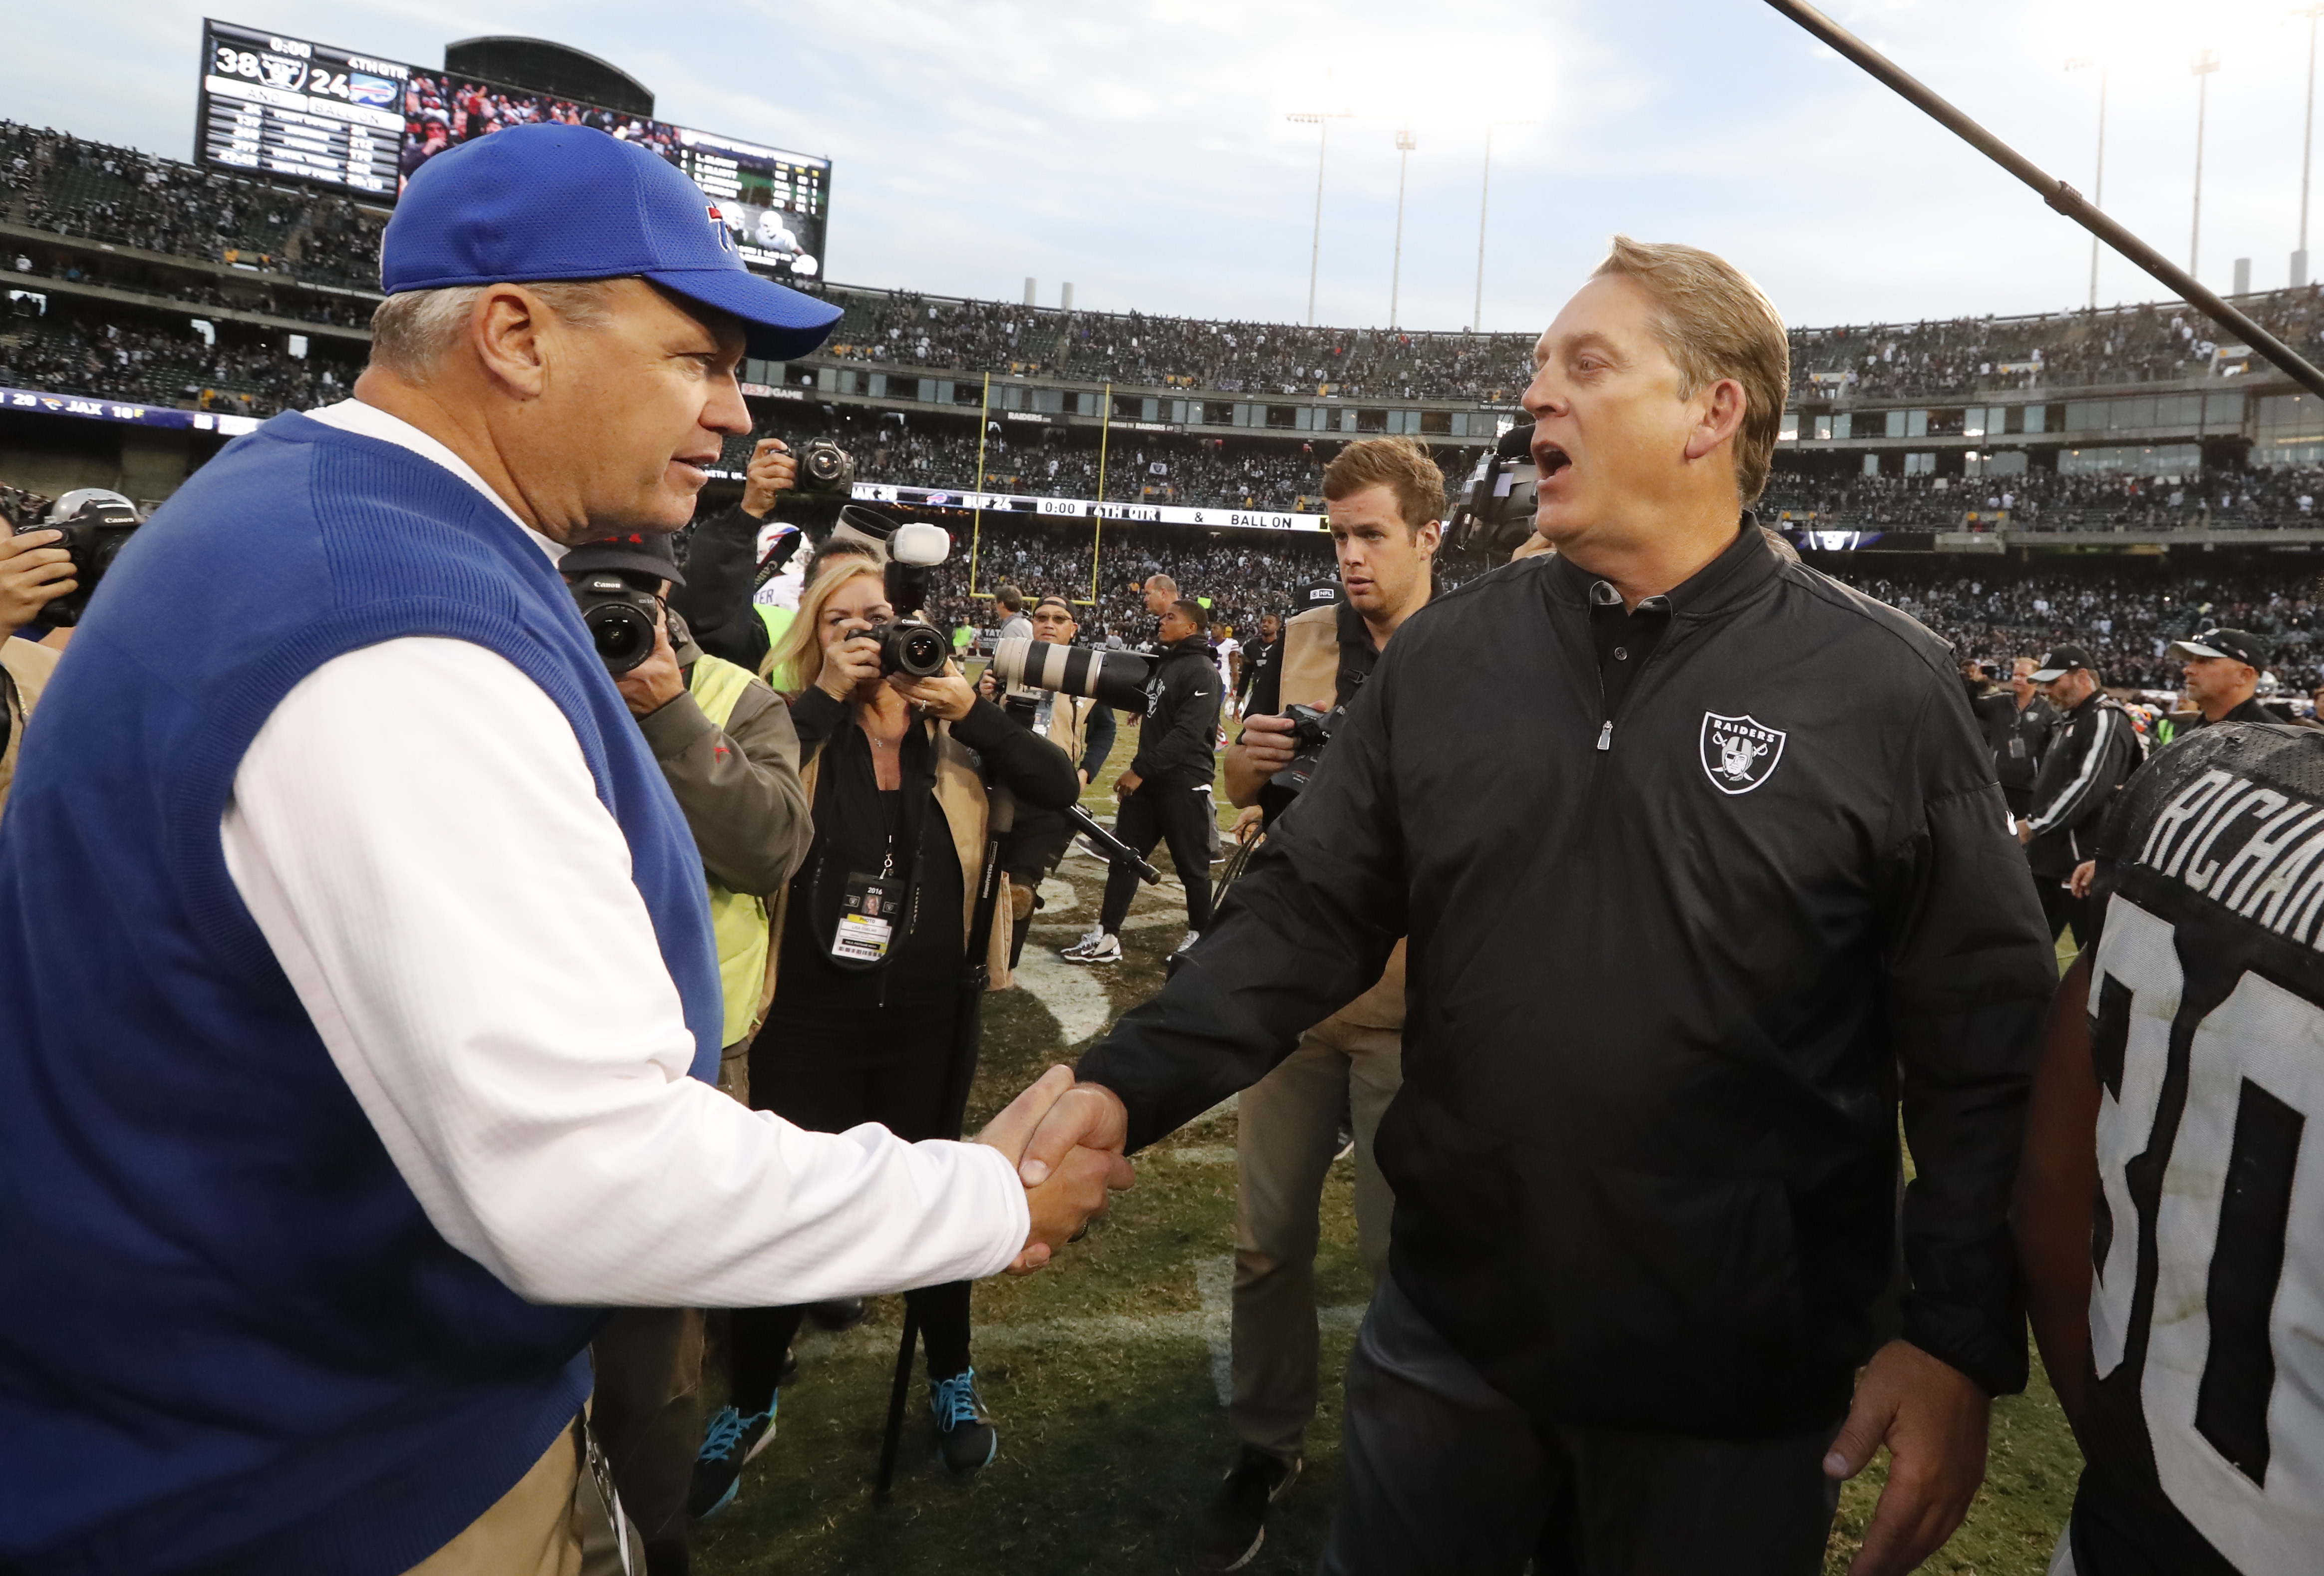 Buffalo Bills head coach Rex Ryan and Oakland Raiders head coach Jack DelRio shake hands after a Raiders win Sunday. (Harry Scull Jr./Buffalo News)